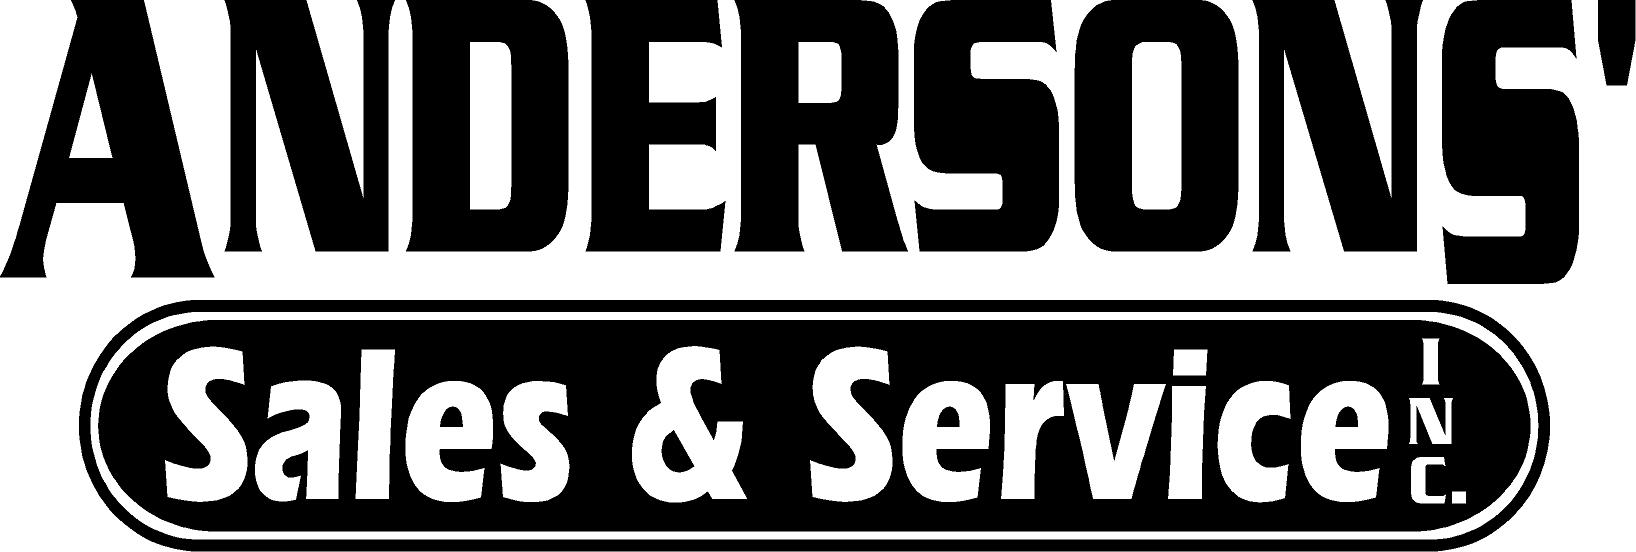 Andersons' Sales & Service, Inc